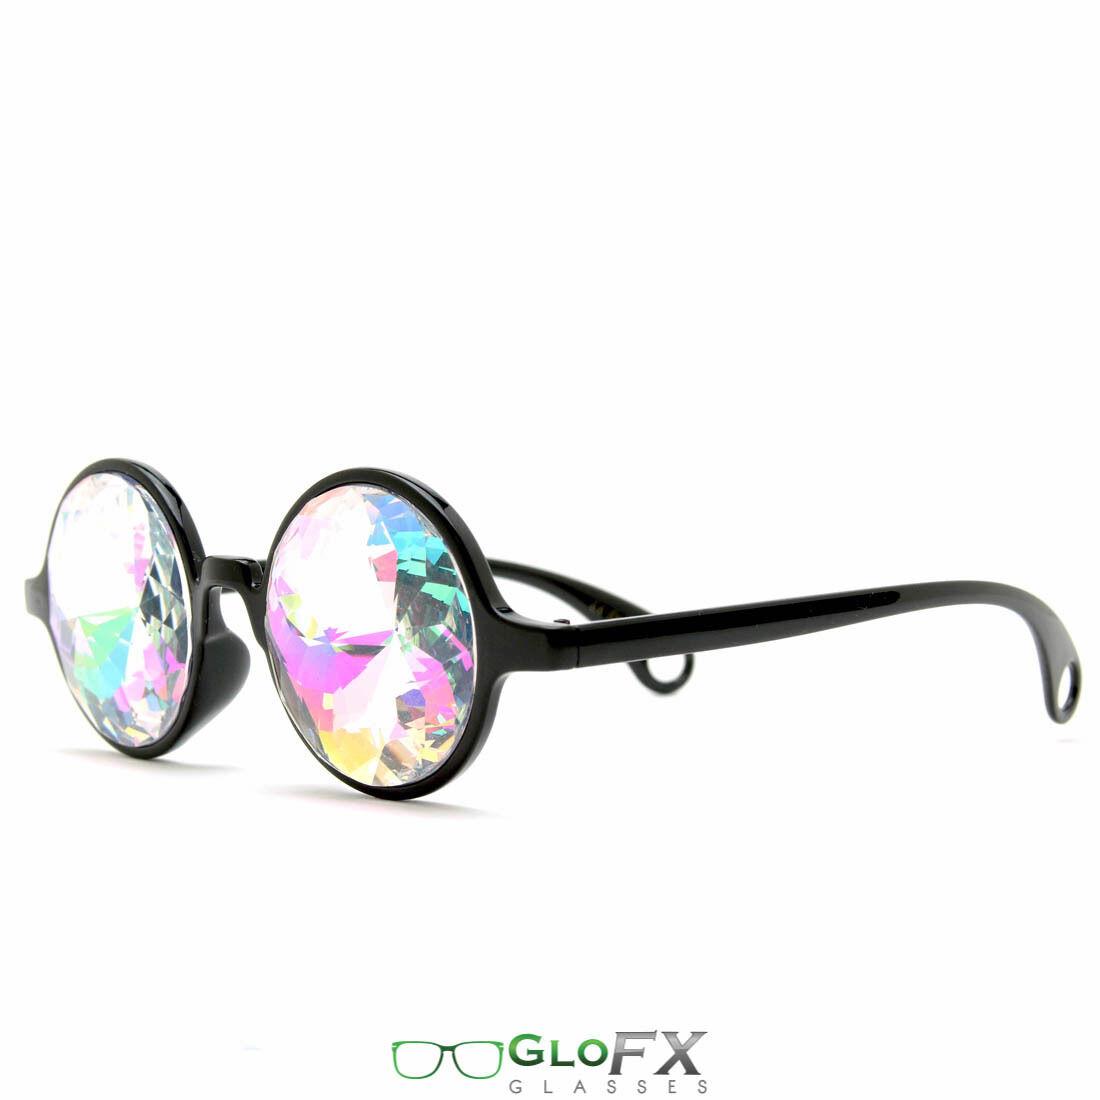 Kaleidoscope Eyeglass Trippy Psychedelic Futuristic